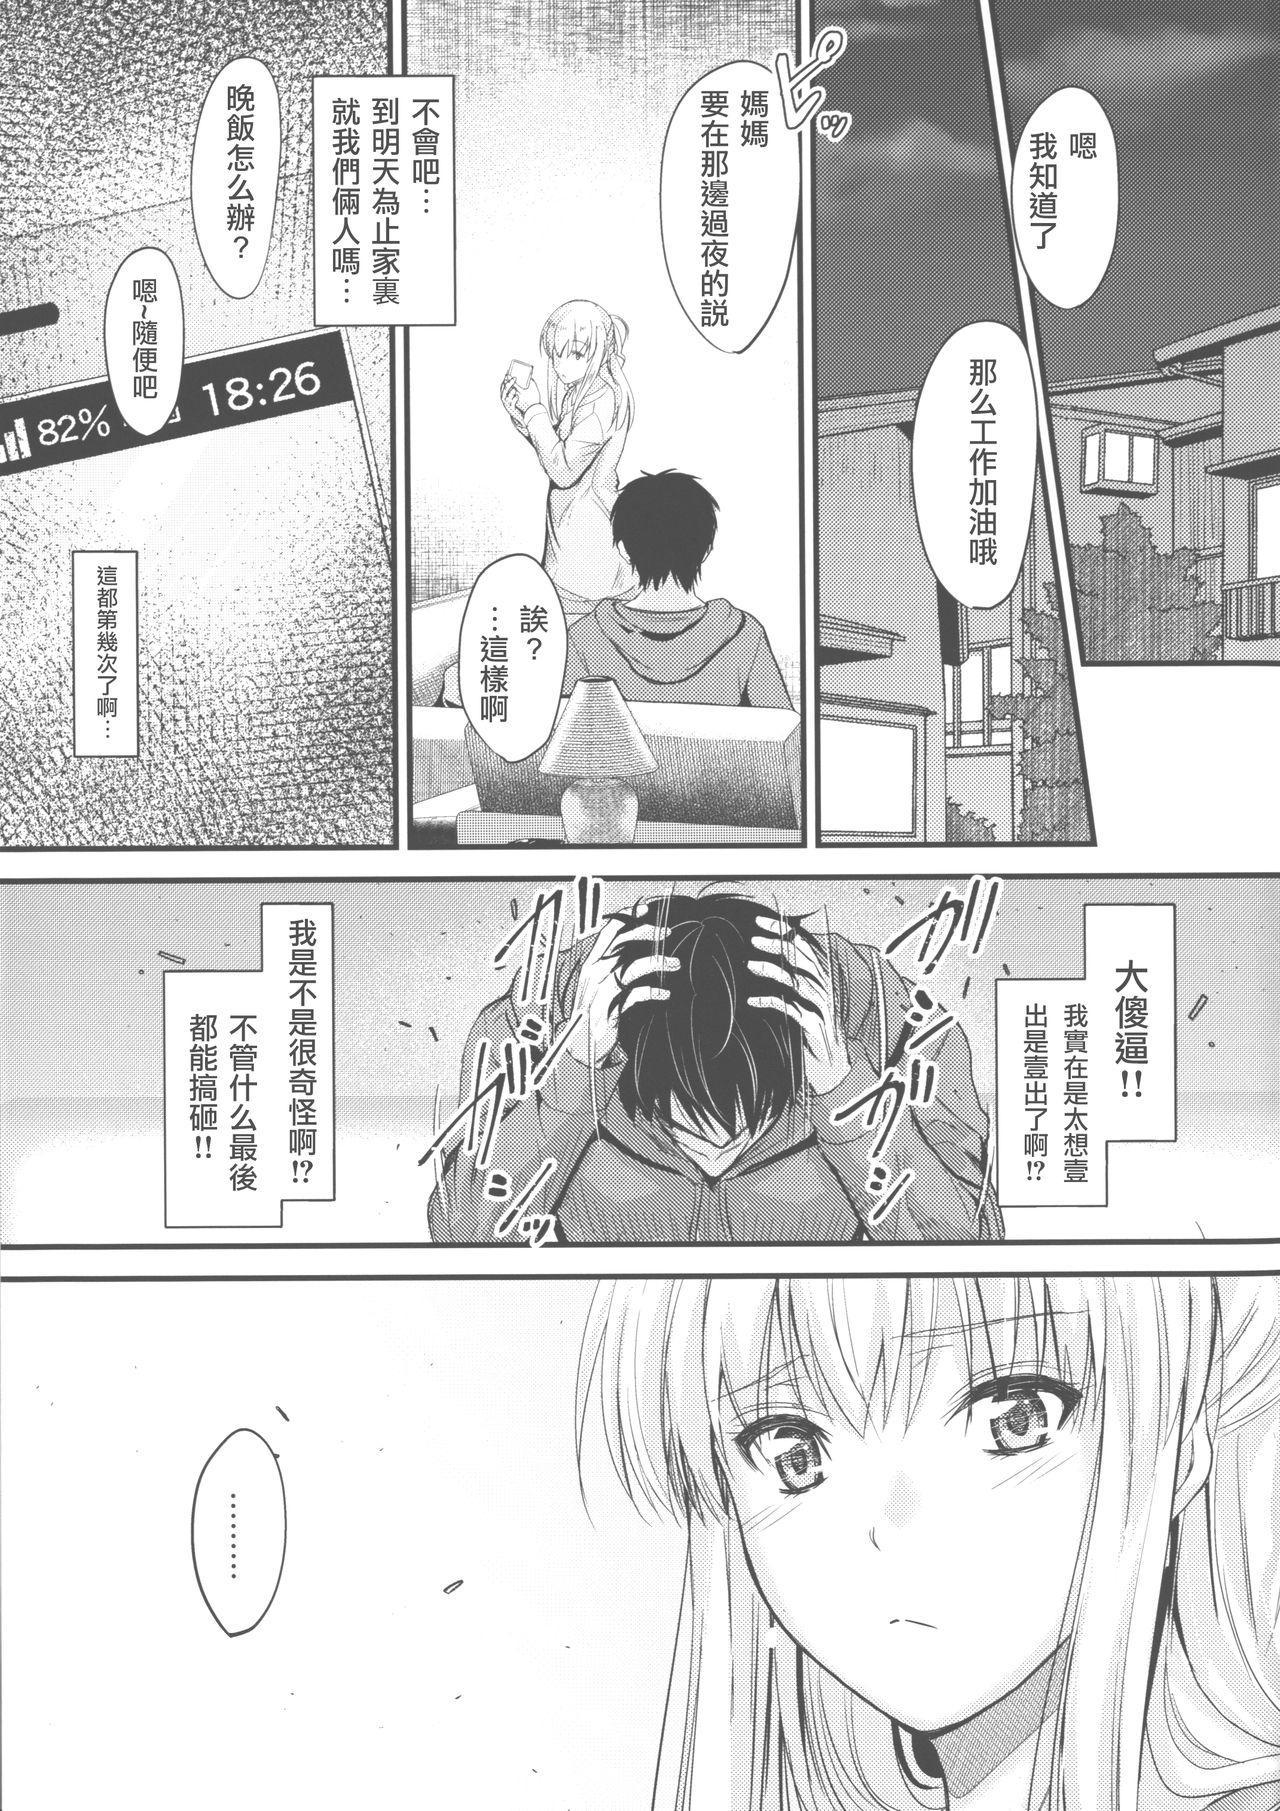 Ore to Imouto no Naishogoto 3 Kouhen 16